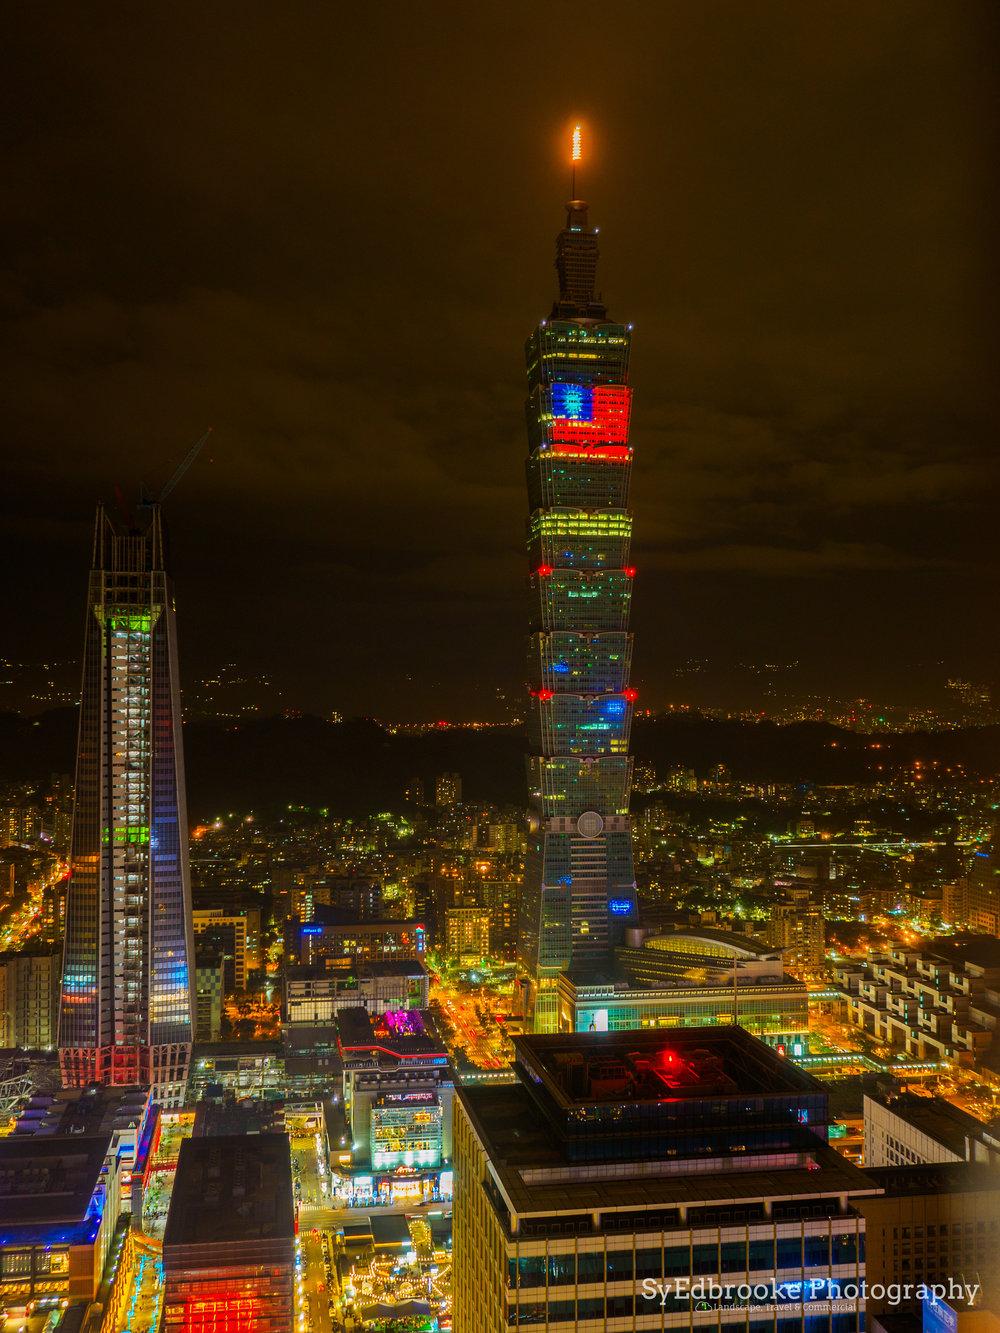 Taipei 101. f3.5, ISO 200, 1, 35mm